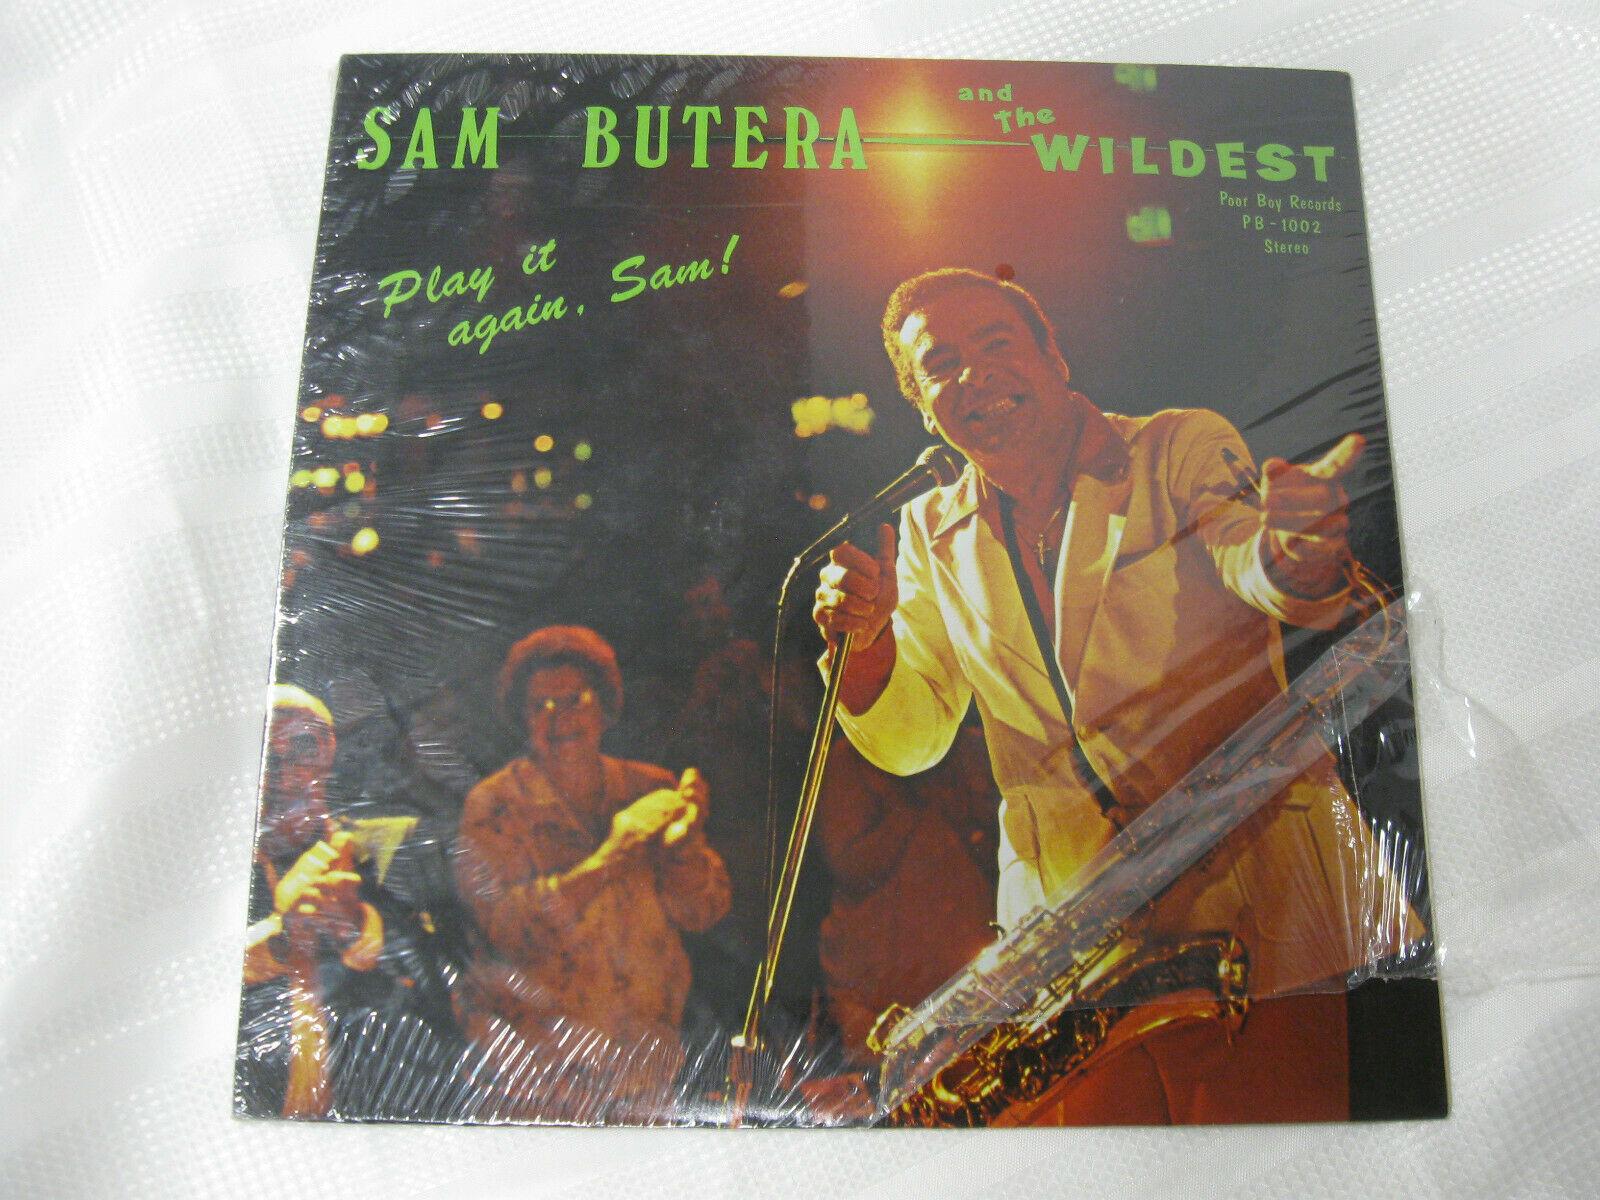 Sam Butera Play It Again Poor Boy PB1002 Vinyl Record Sealed LP SIGNED Toby